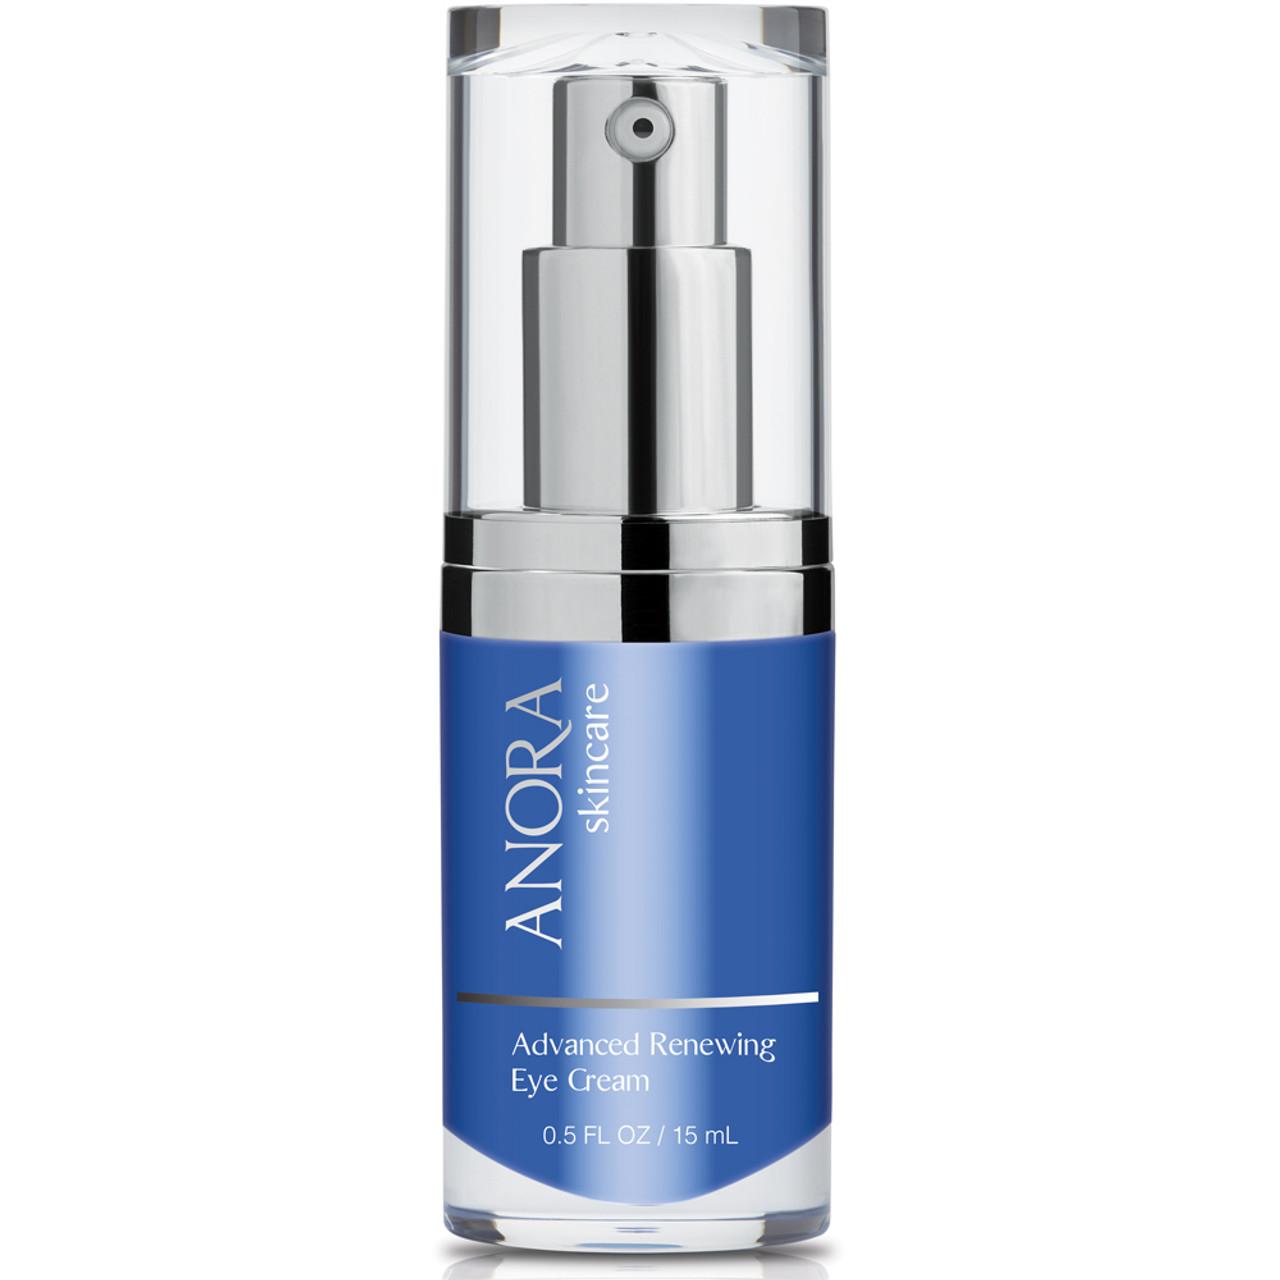 Anora Skincare Advanced Renewing Eye Cream BeautifiedYou.com